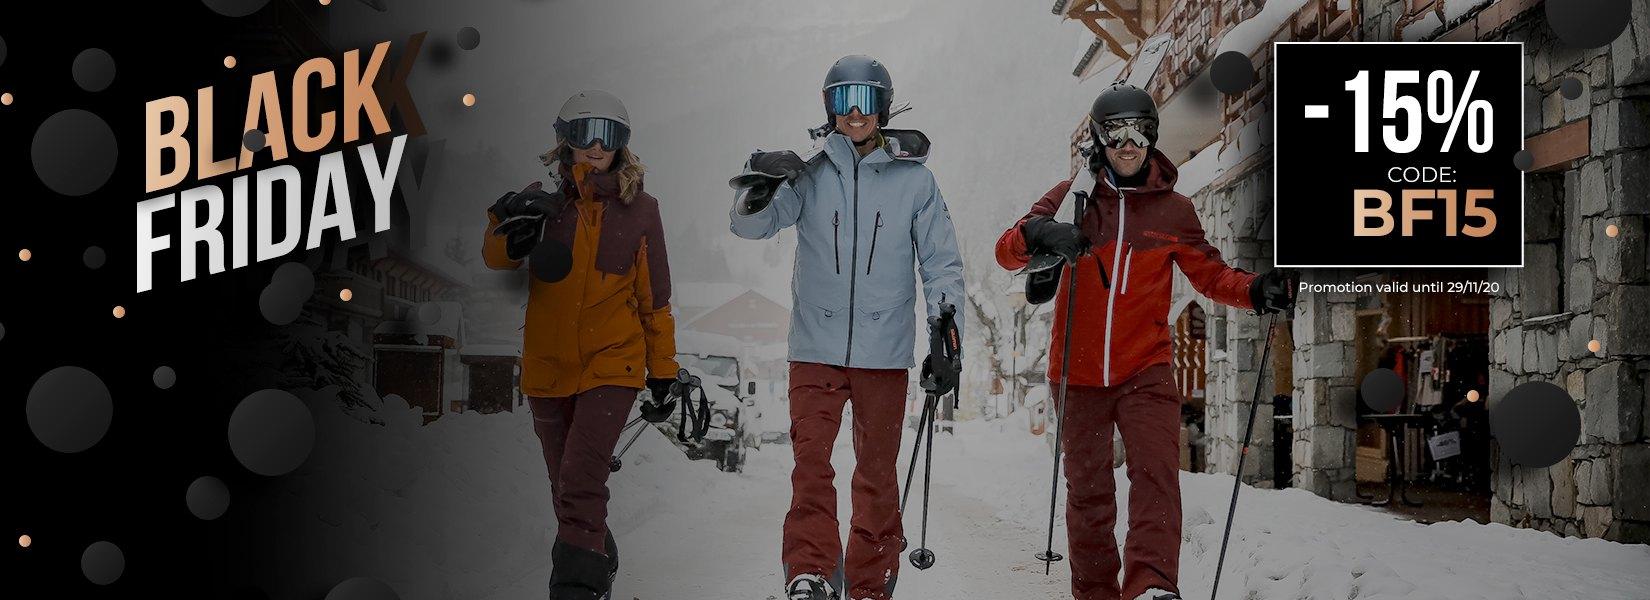 Ski Deals & Special Offers